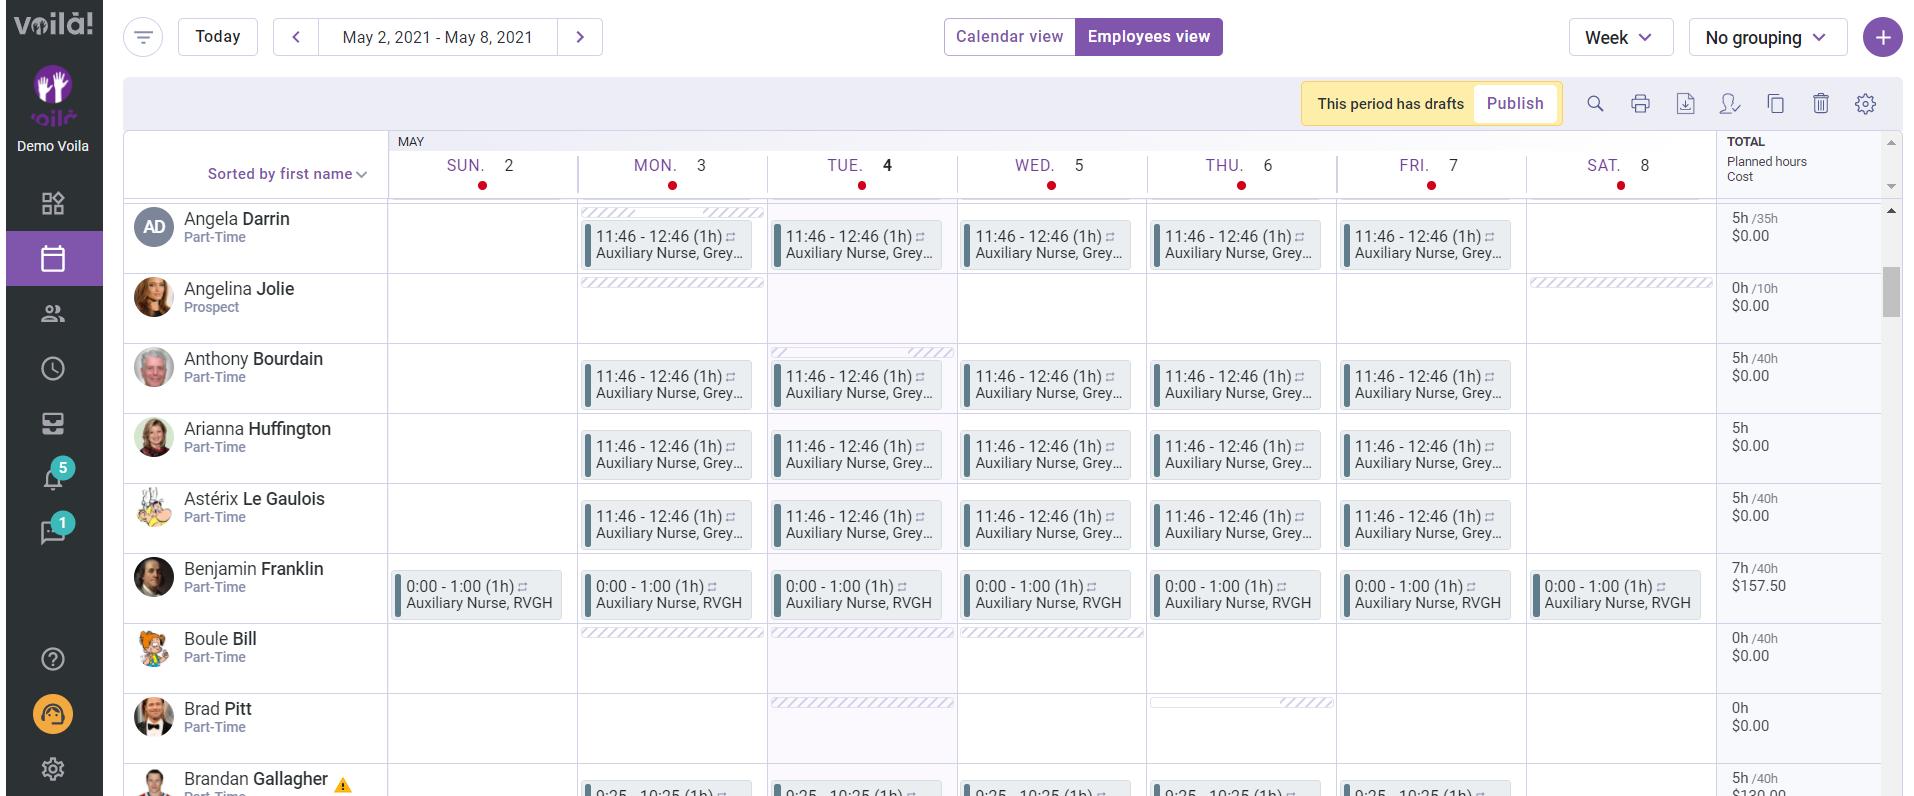 Employees' Schedule